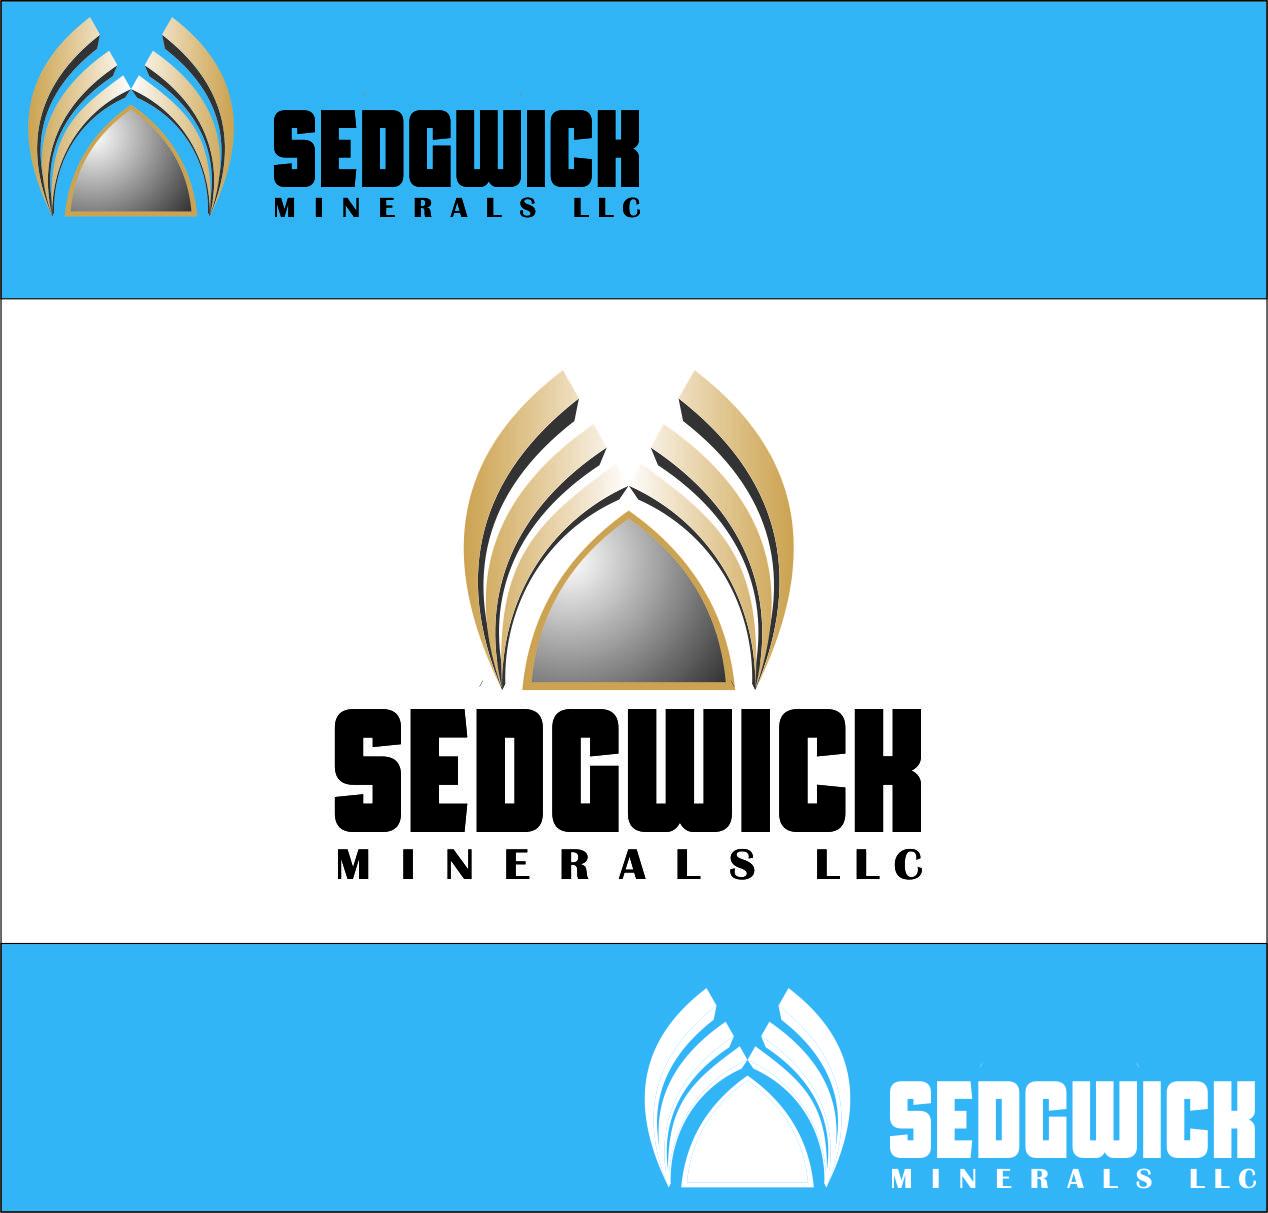 Logo Design by Agus Martoyo - Entry No. 55 in the Logo Design Contest Inspiring Logo Design for Sedgwick Minerals, LLC.